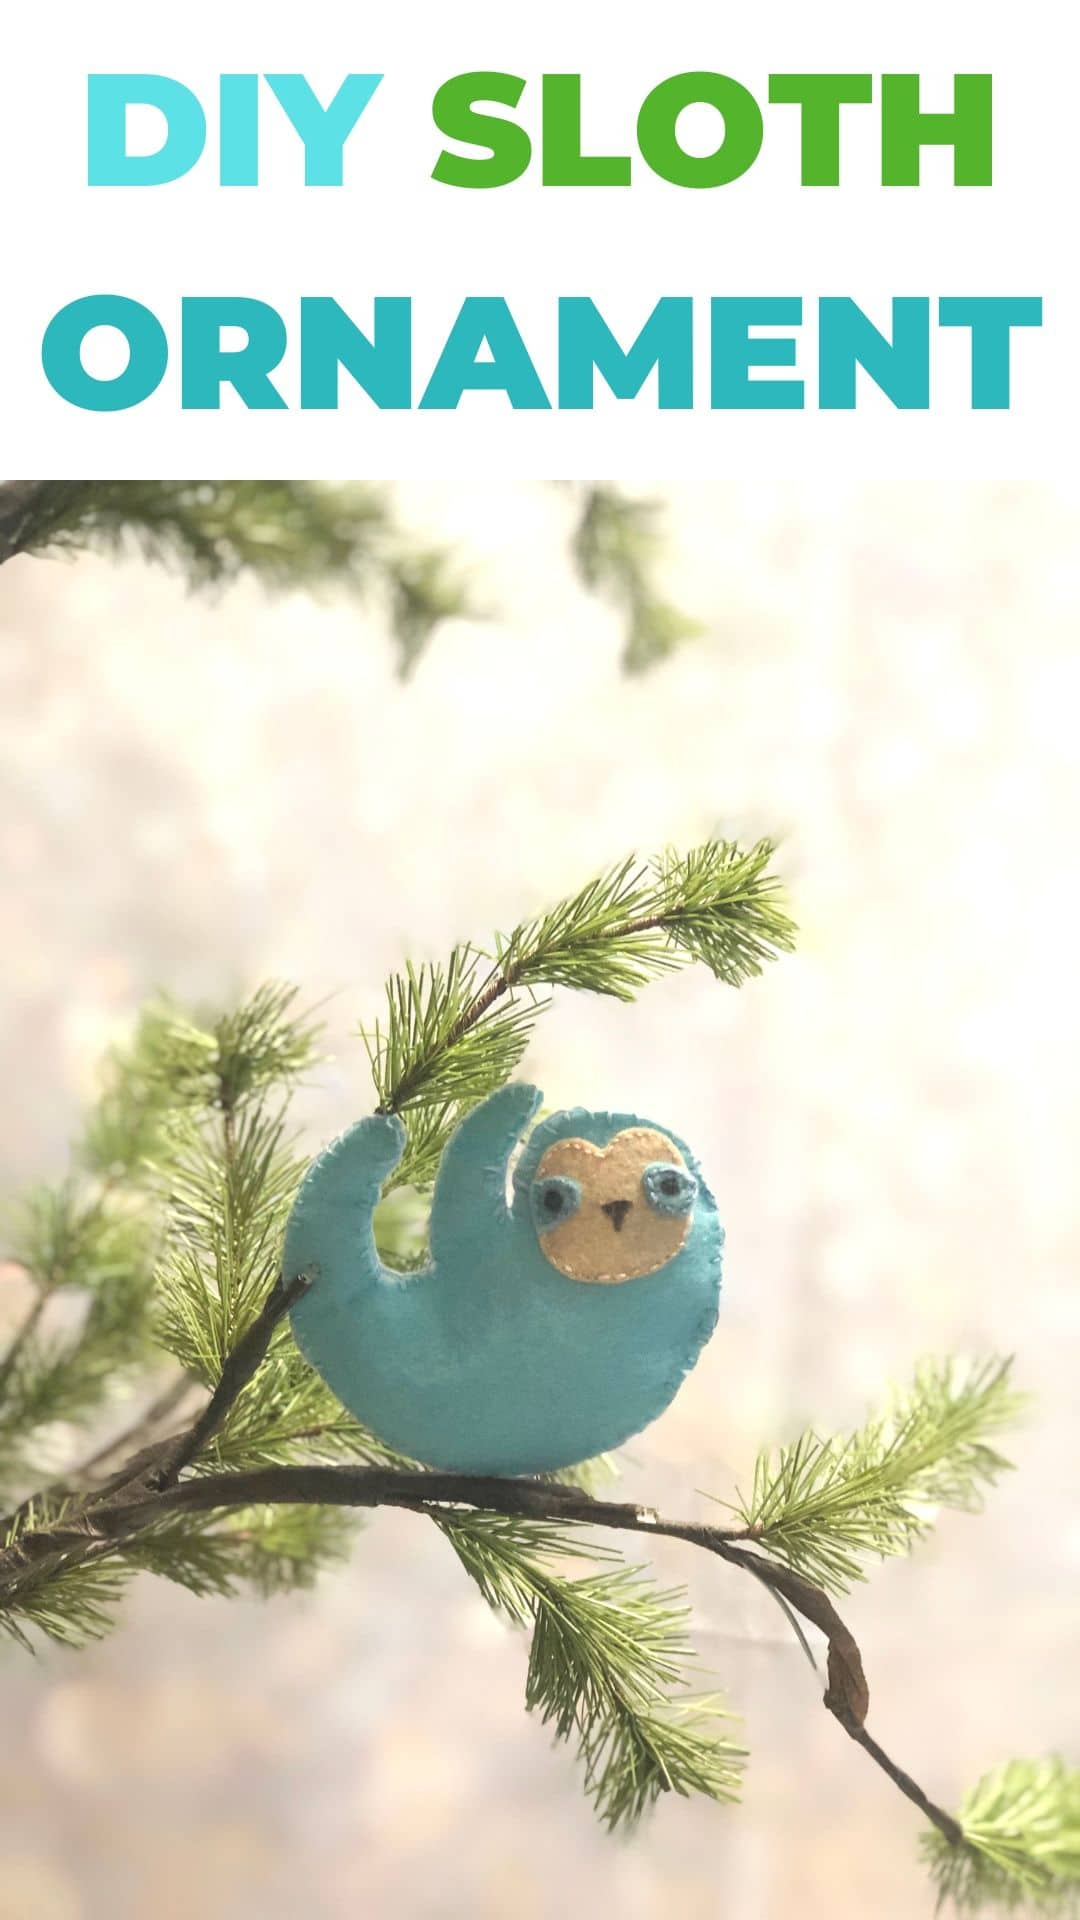 DIY Sloth Ornament via @brookeberry